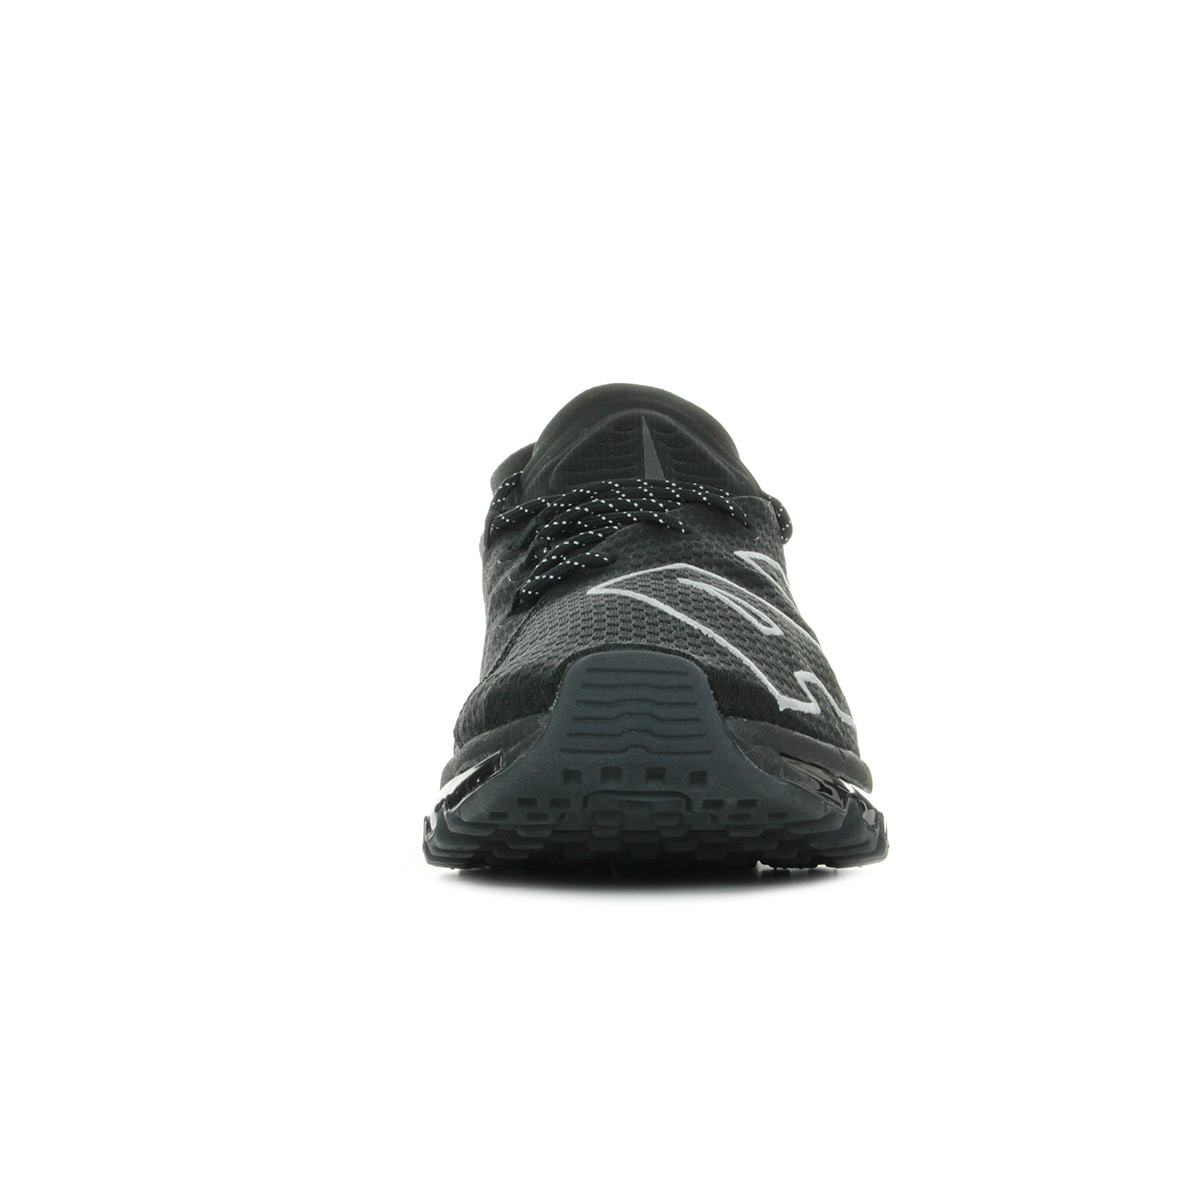 Chaussures Baskets Nike homme Air Max Flair taille Noir Noire